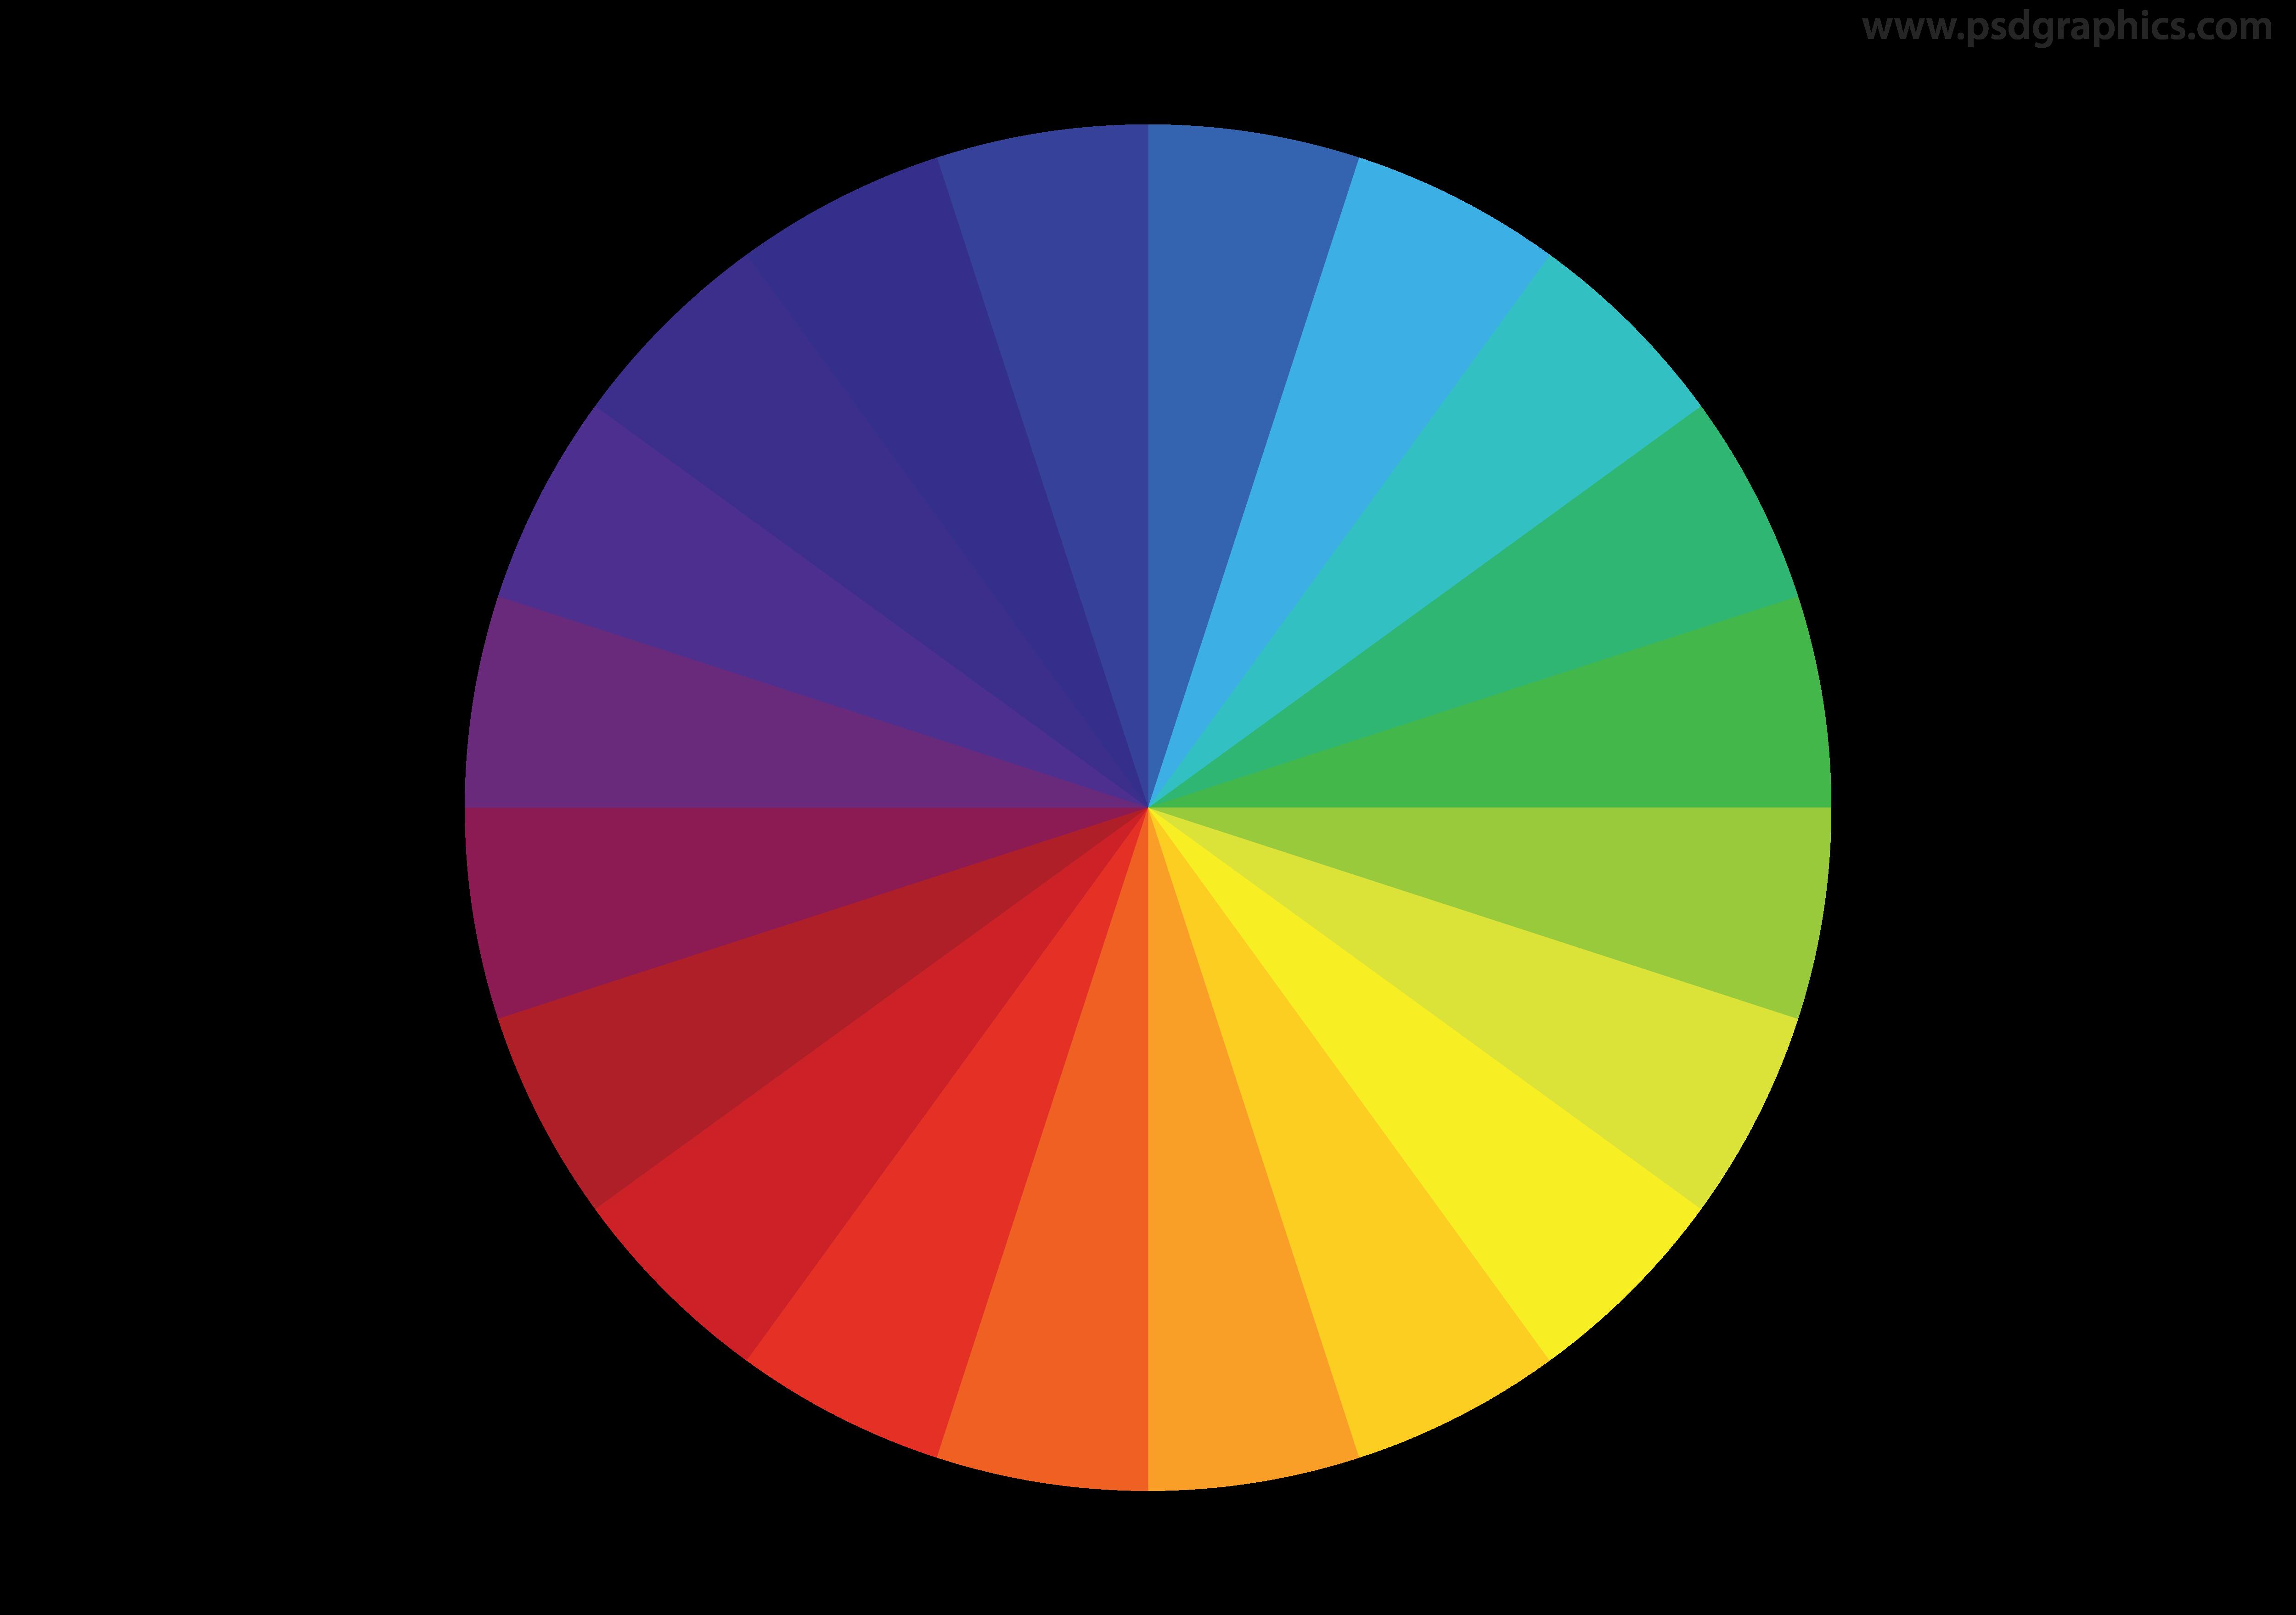 5000x3517 Color Wheel Vector Psdgraphics